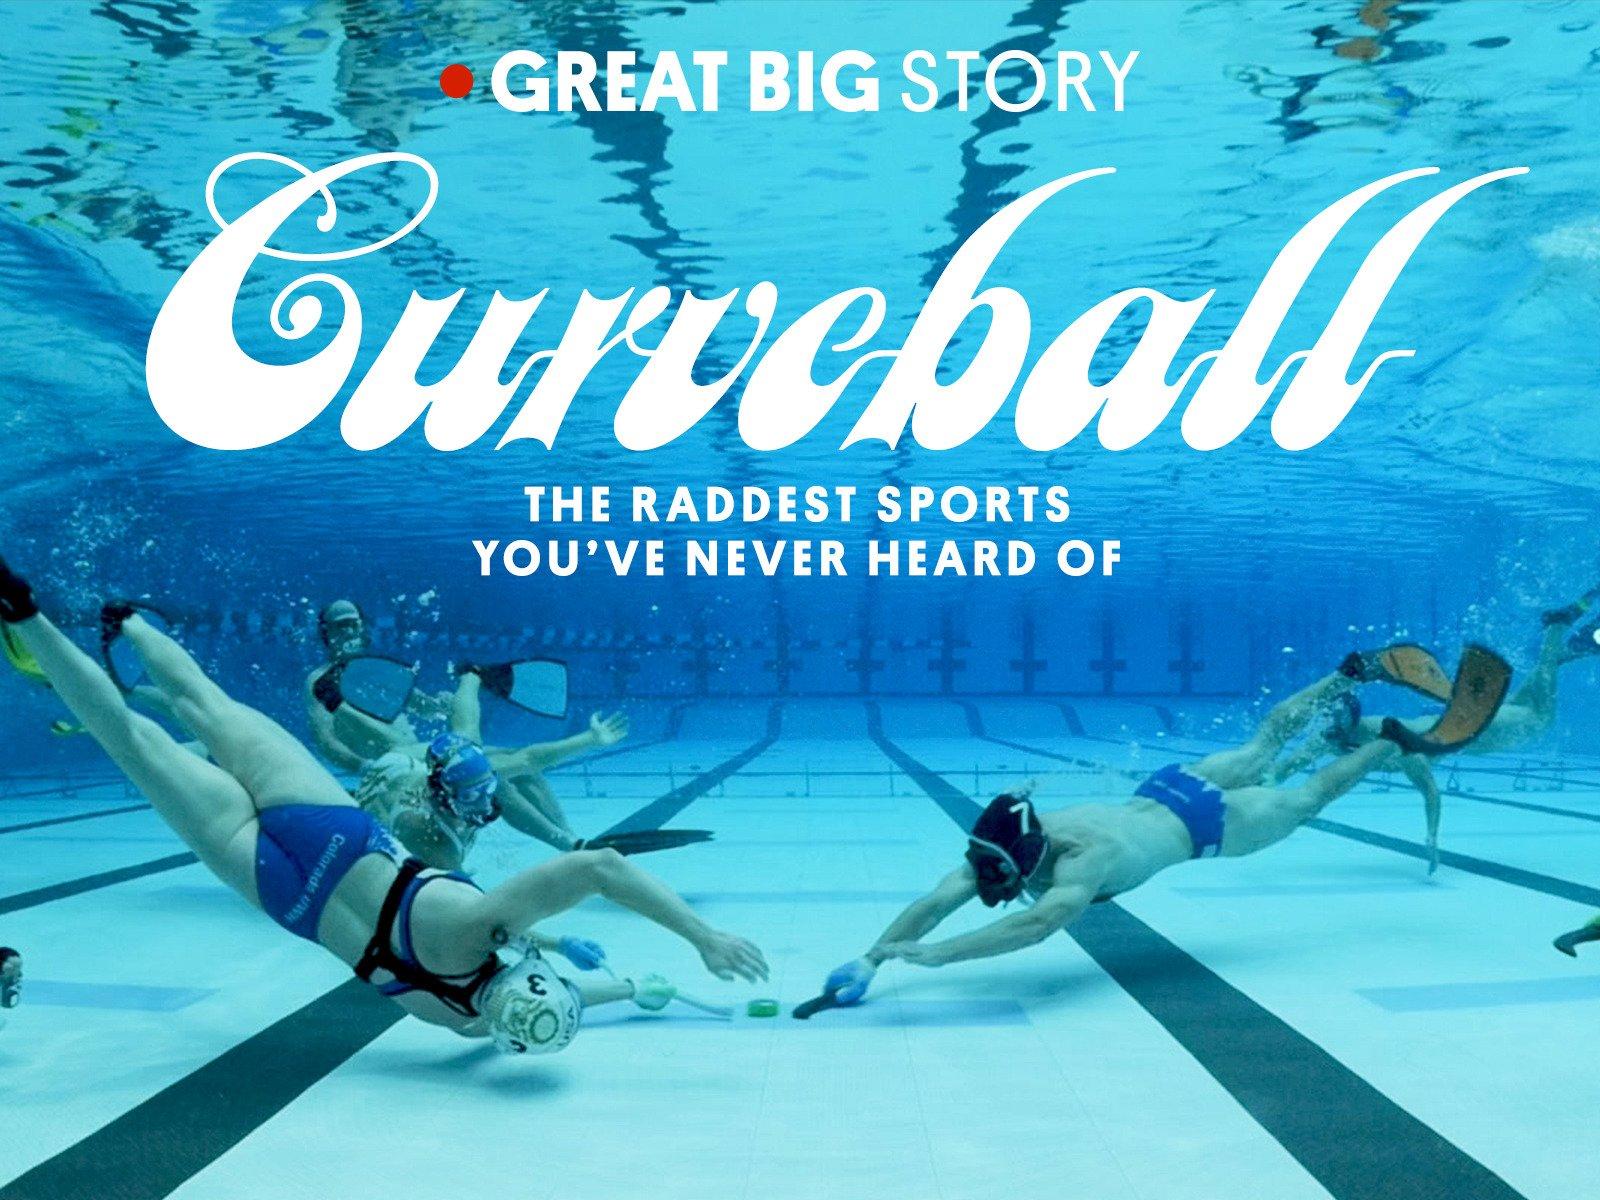 Curveball: The Raddest Sports You've Never Heard Of - Season 1